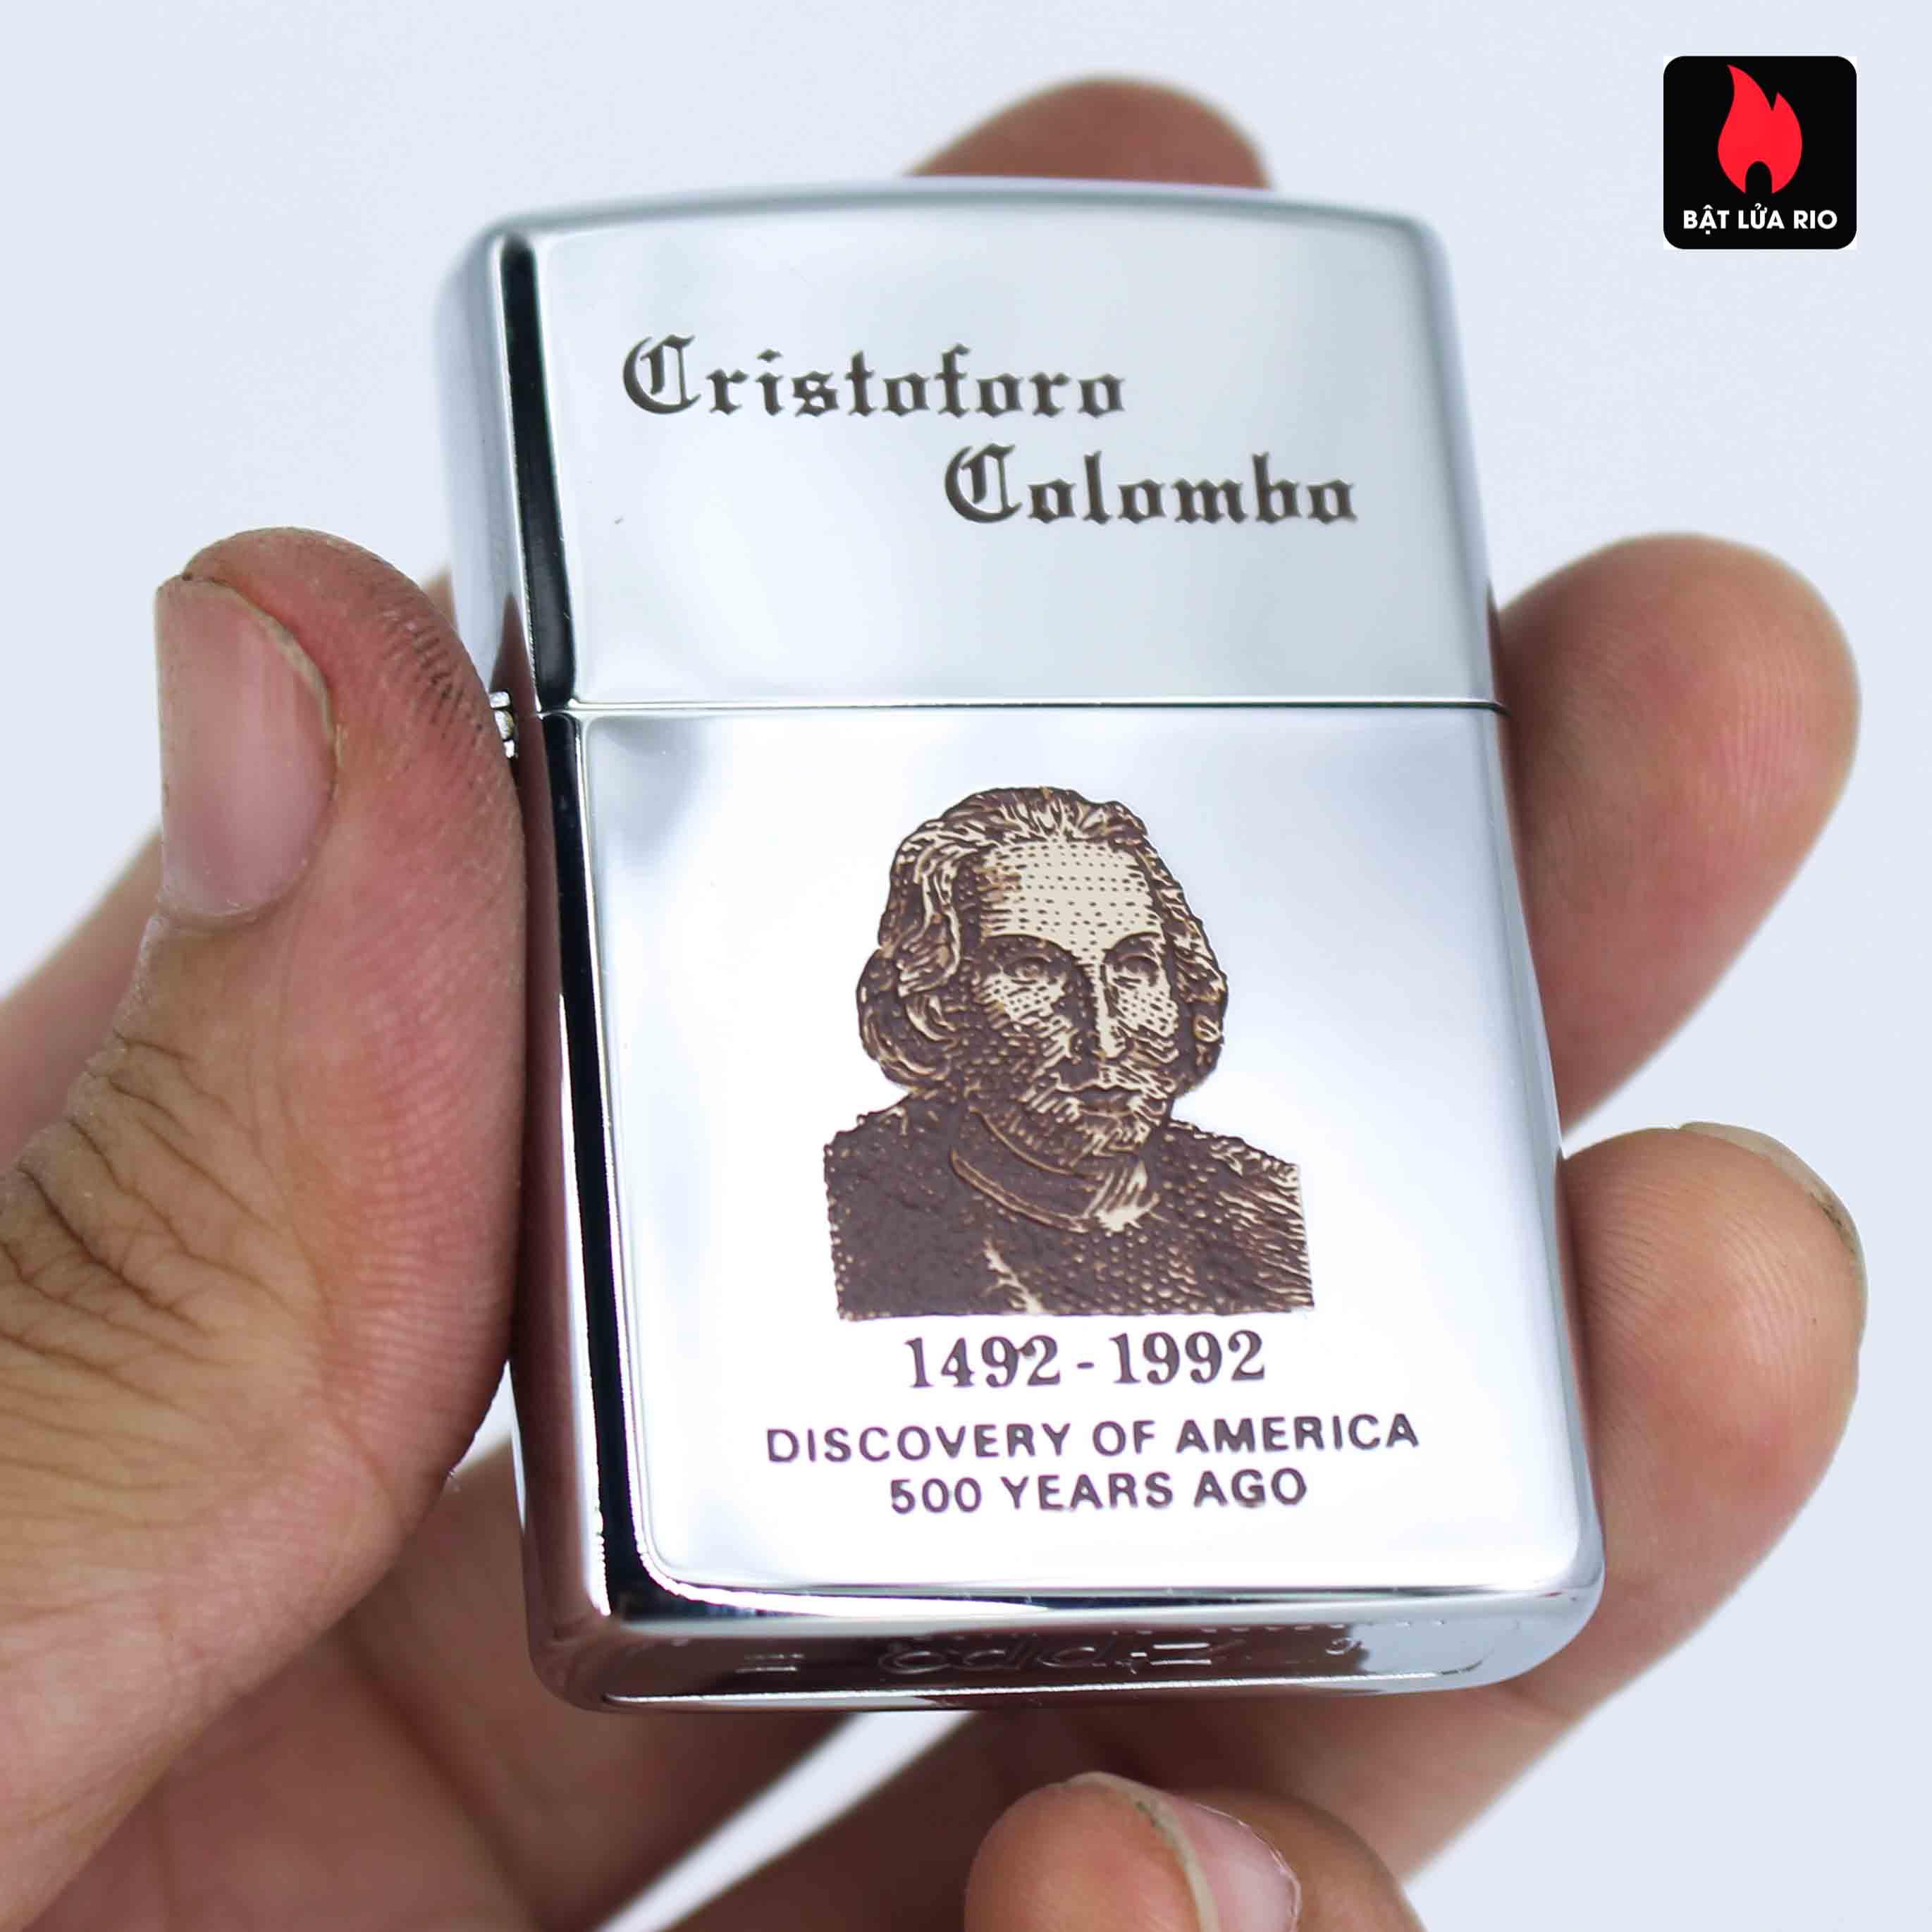 Zippo La Mã 1991 - Cristoforo Colombo 1492-1992 2